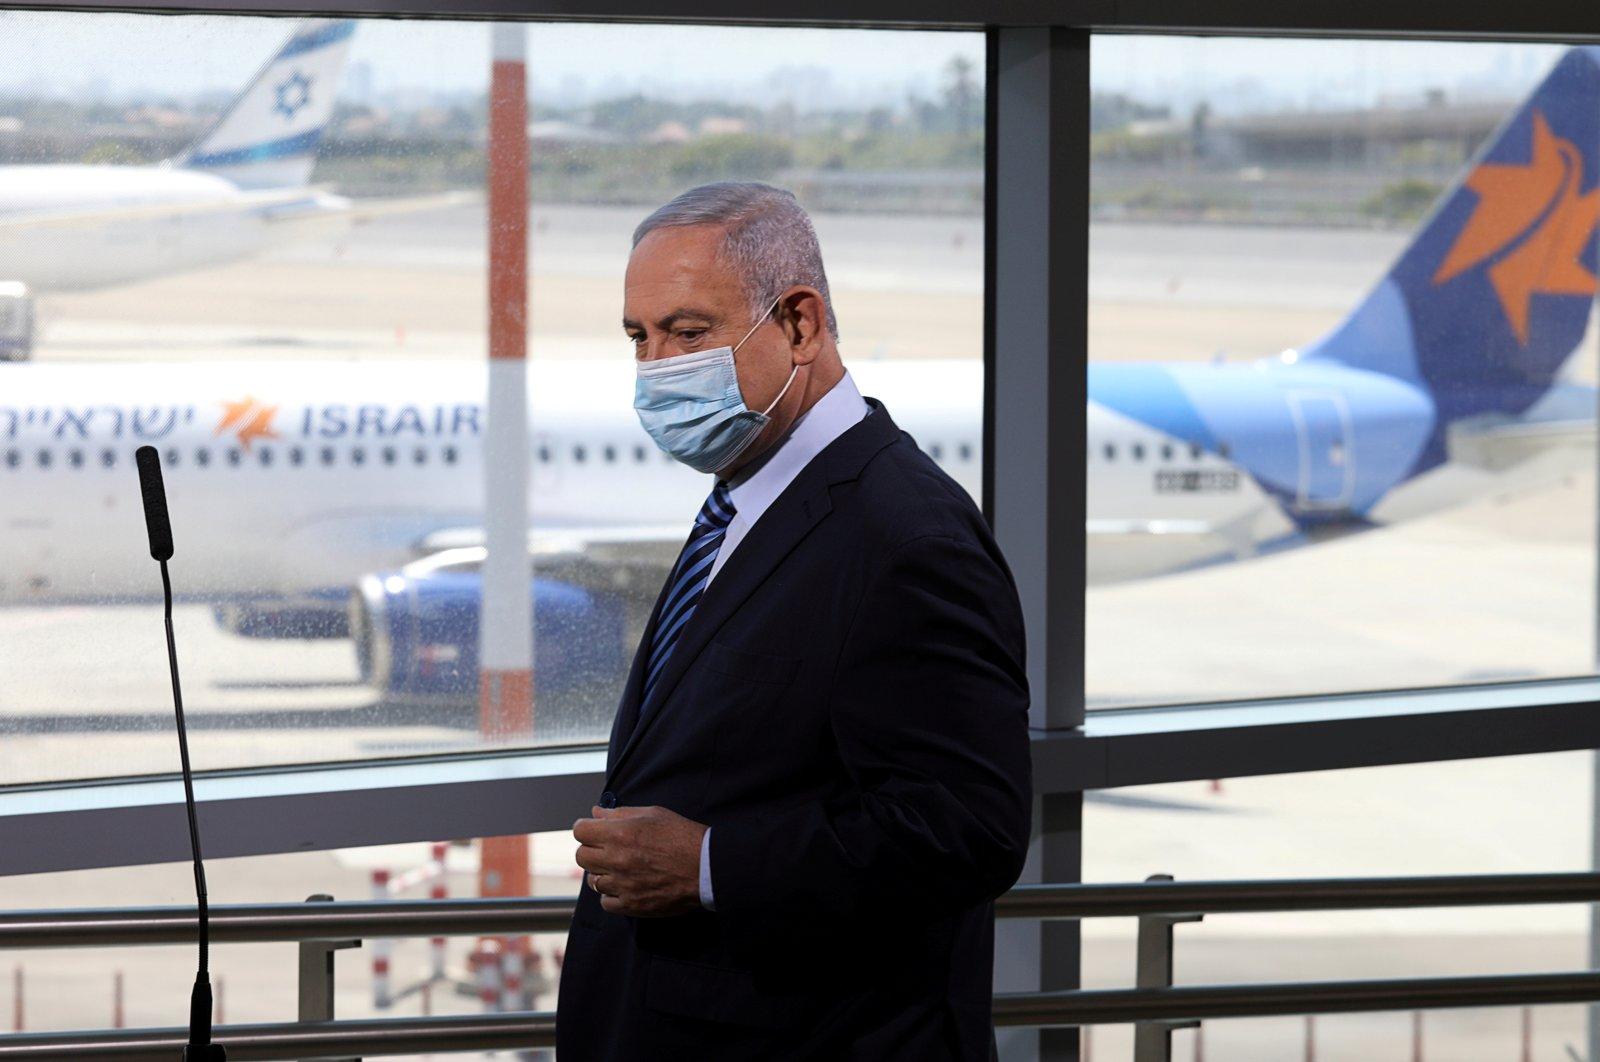 Israeli Prime Minister Benjamin Netanyahu prepares to give a statement at Ben Gurion International Airport, in Lod, near Tel Aviv, Israel on Aug. 17, 2020. (Reuters Photo)